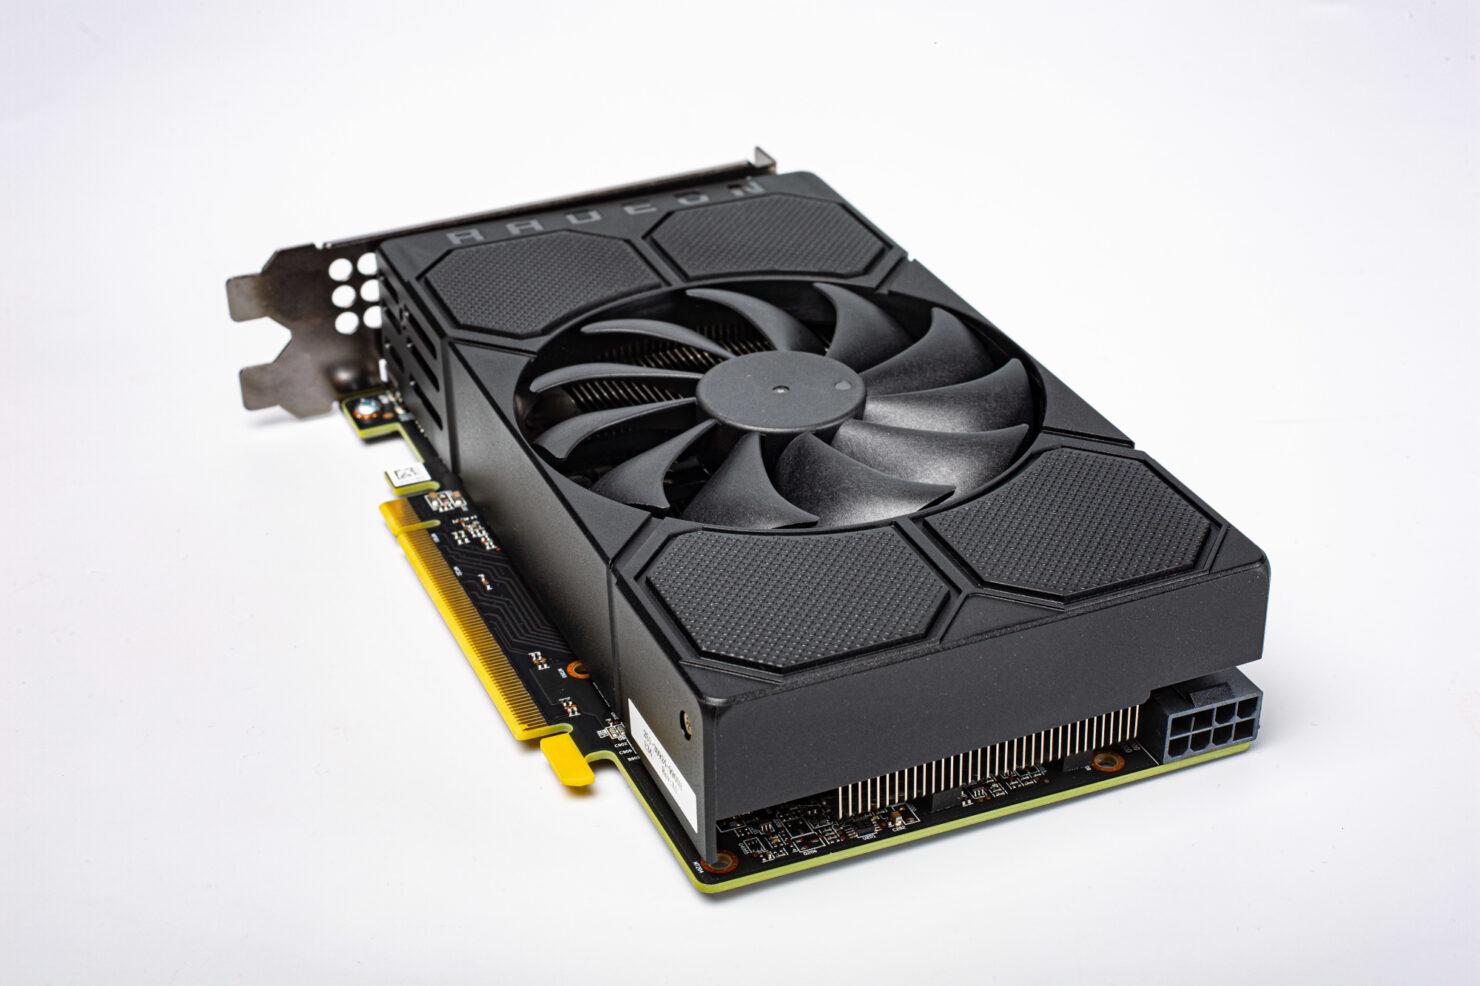 amd-radeon-rx-5500-navi-14-graphics-card-performance-benchmarks_1